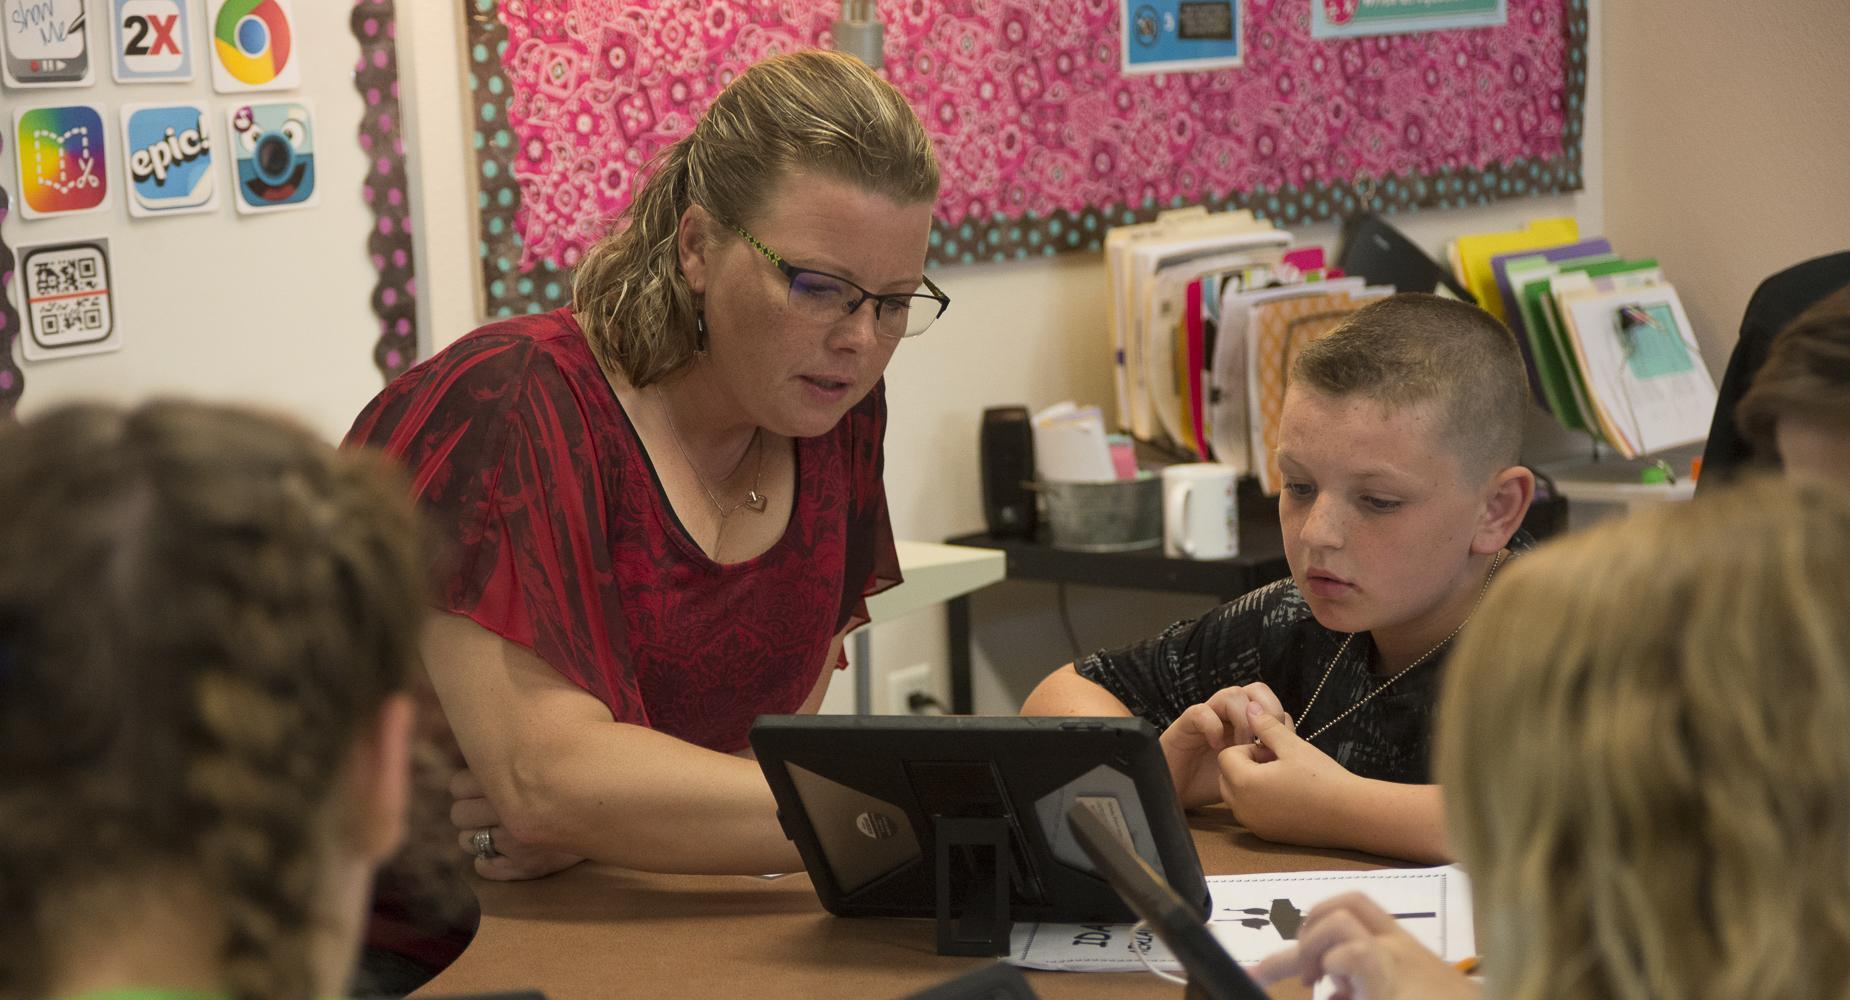 Teacher assists boy with his iPad